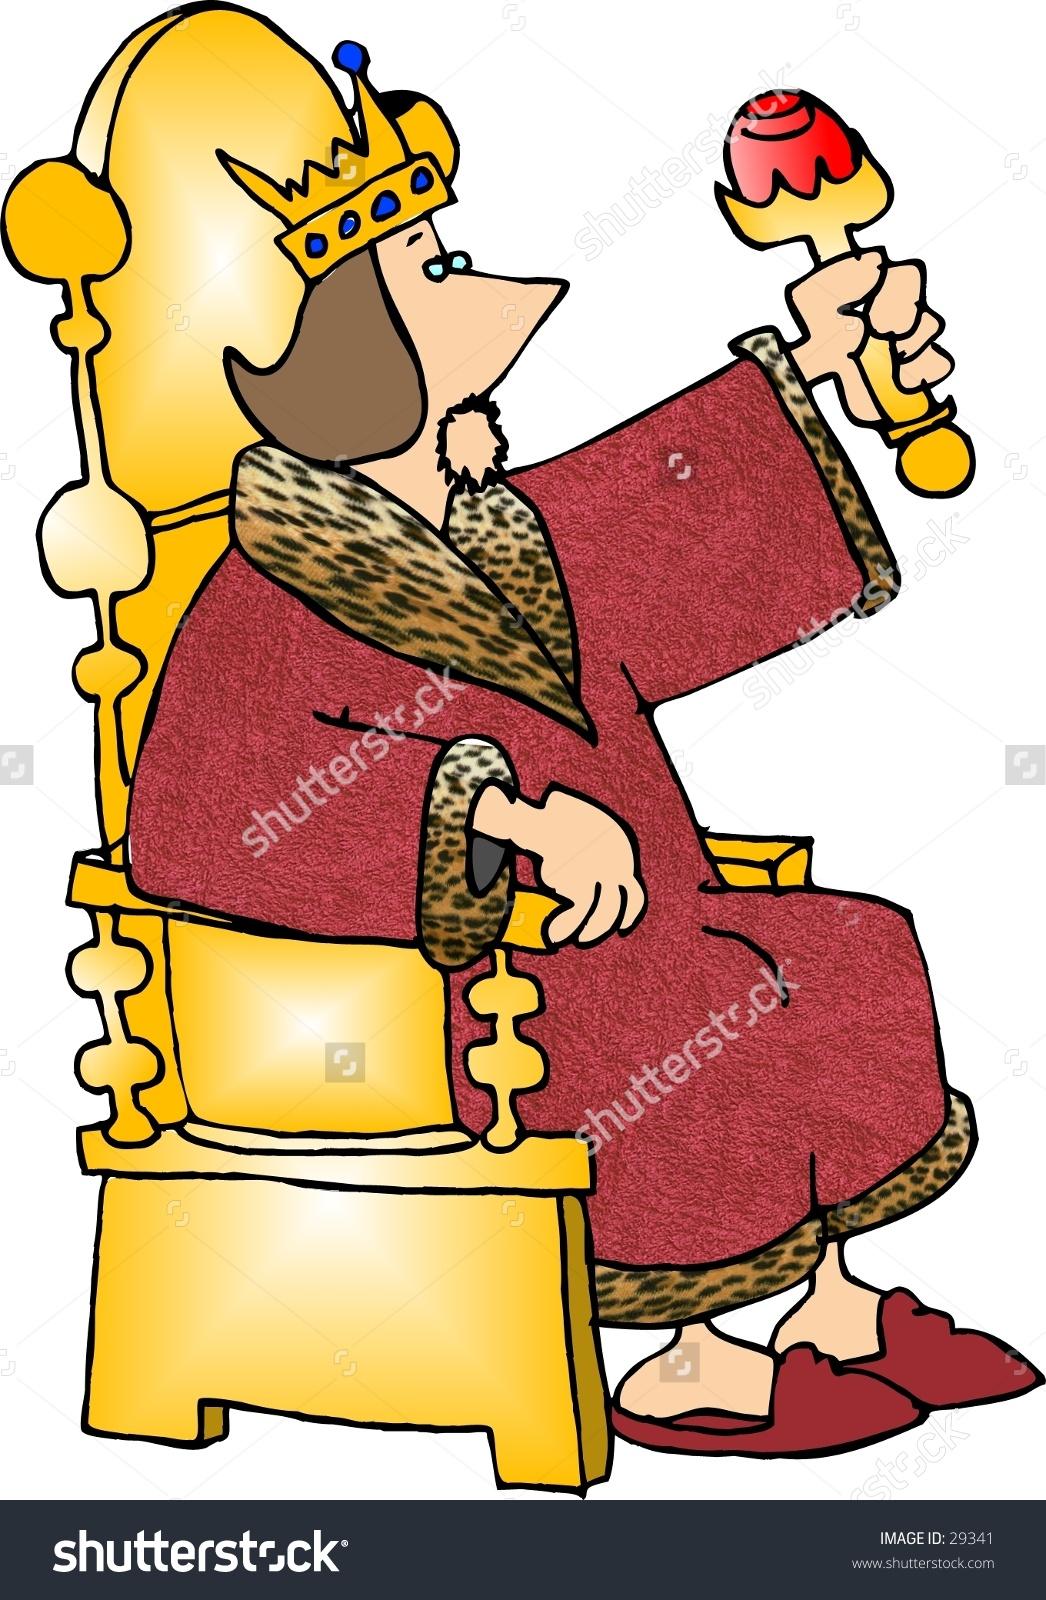 Clipart Illustration King Seated On His Stock Illustration 29341.